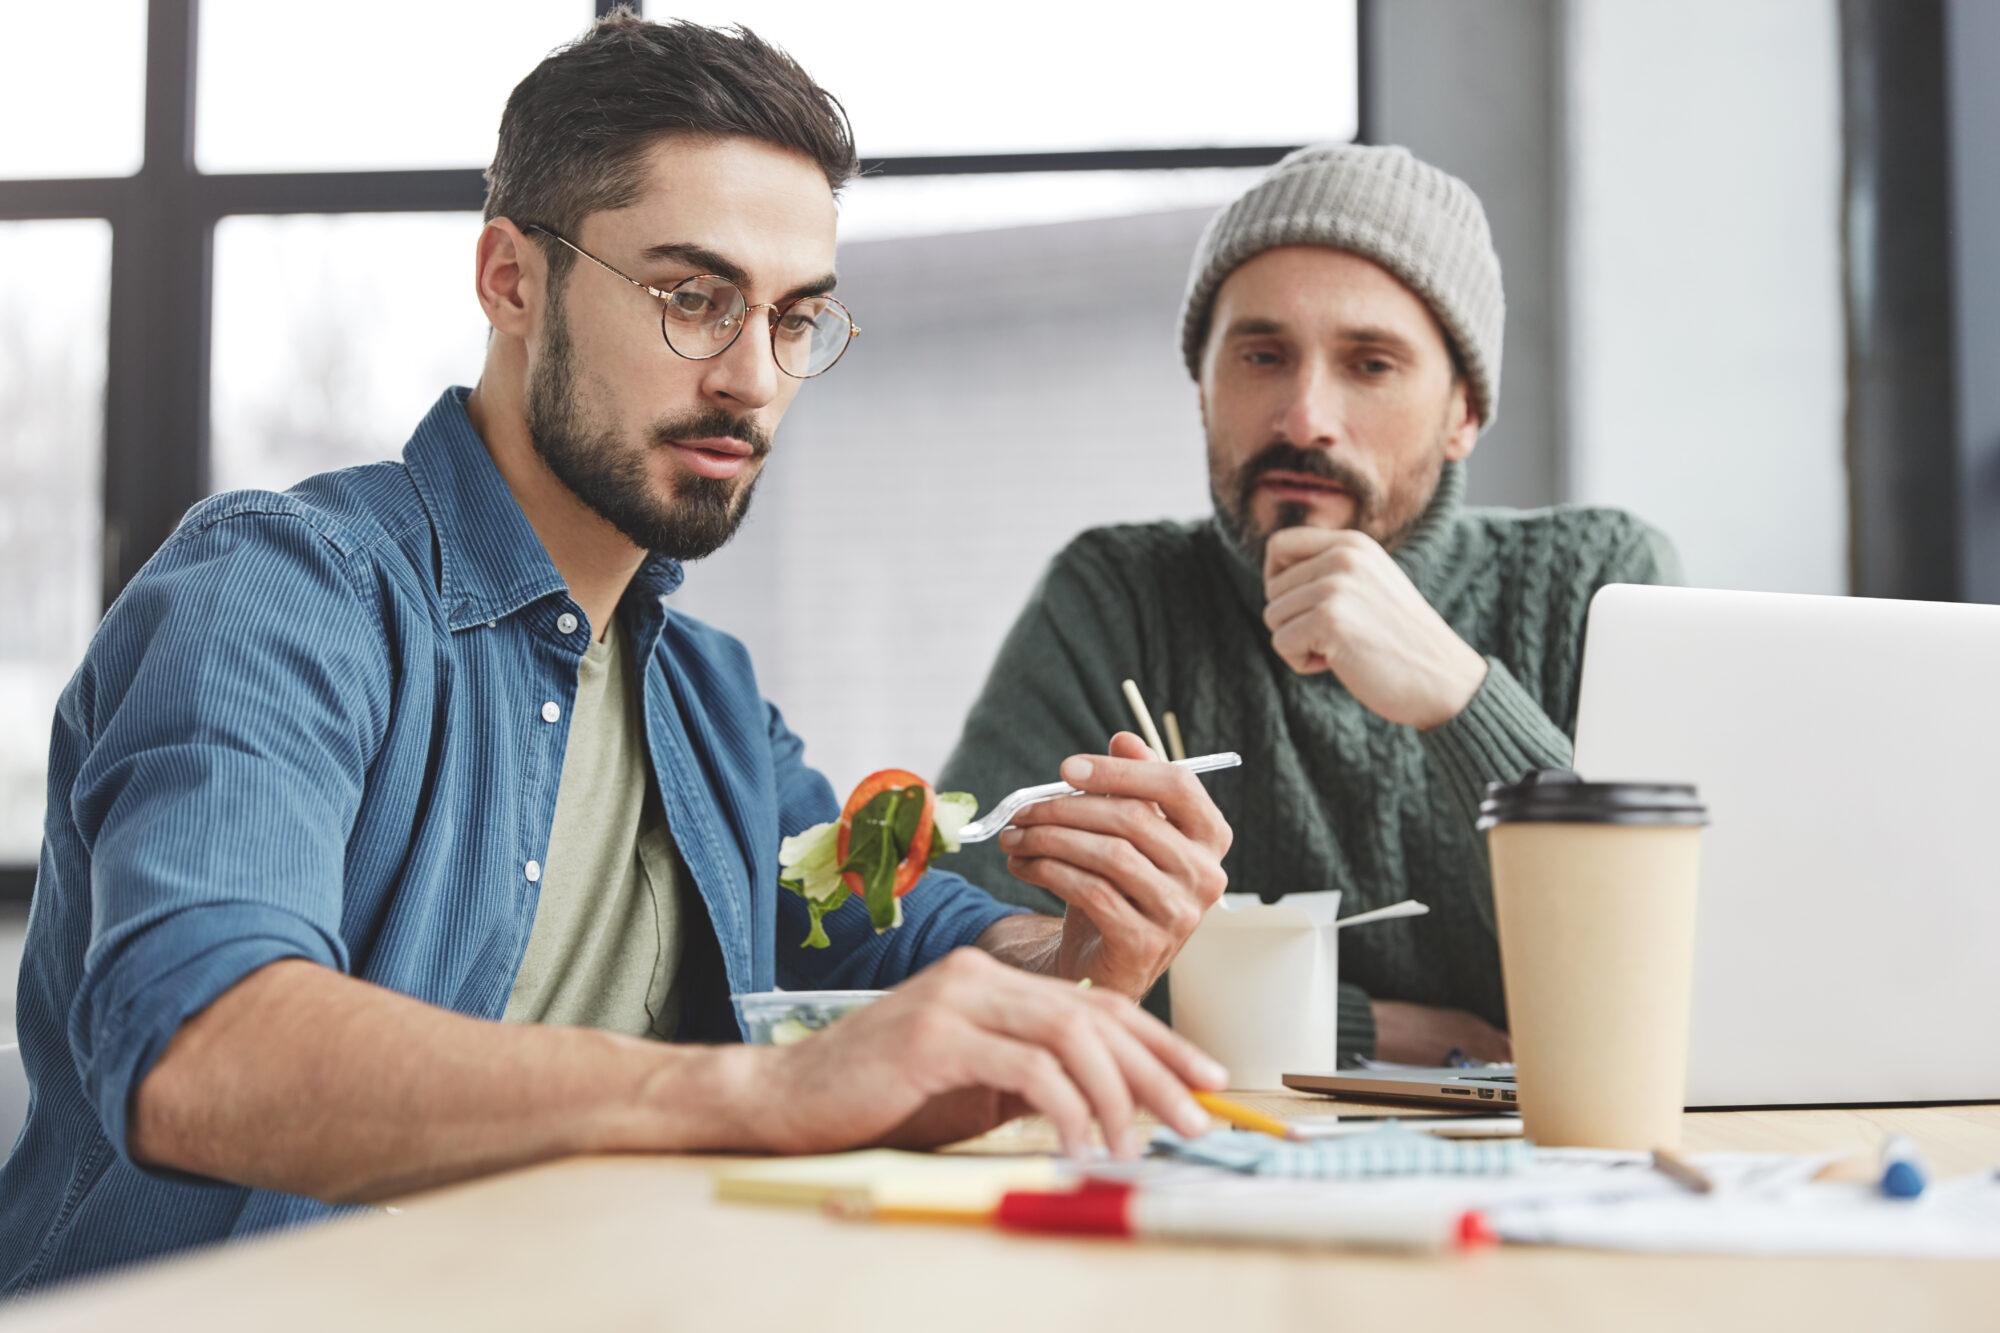 School of Creative Thinking - Opleiding Toegepaste Creativiteit - Introductie